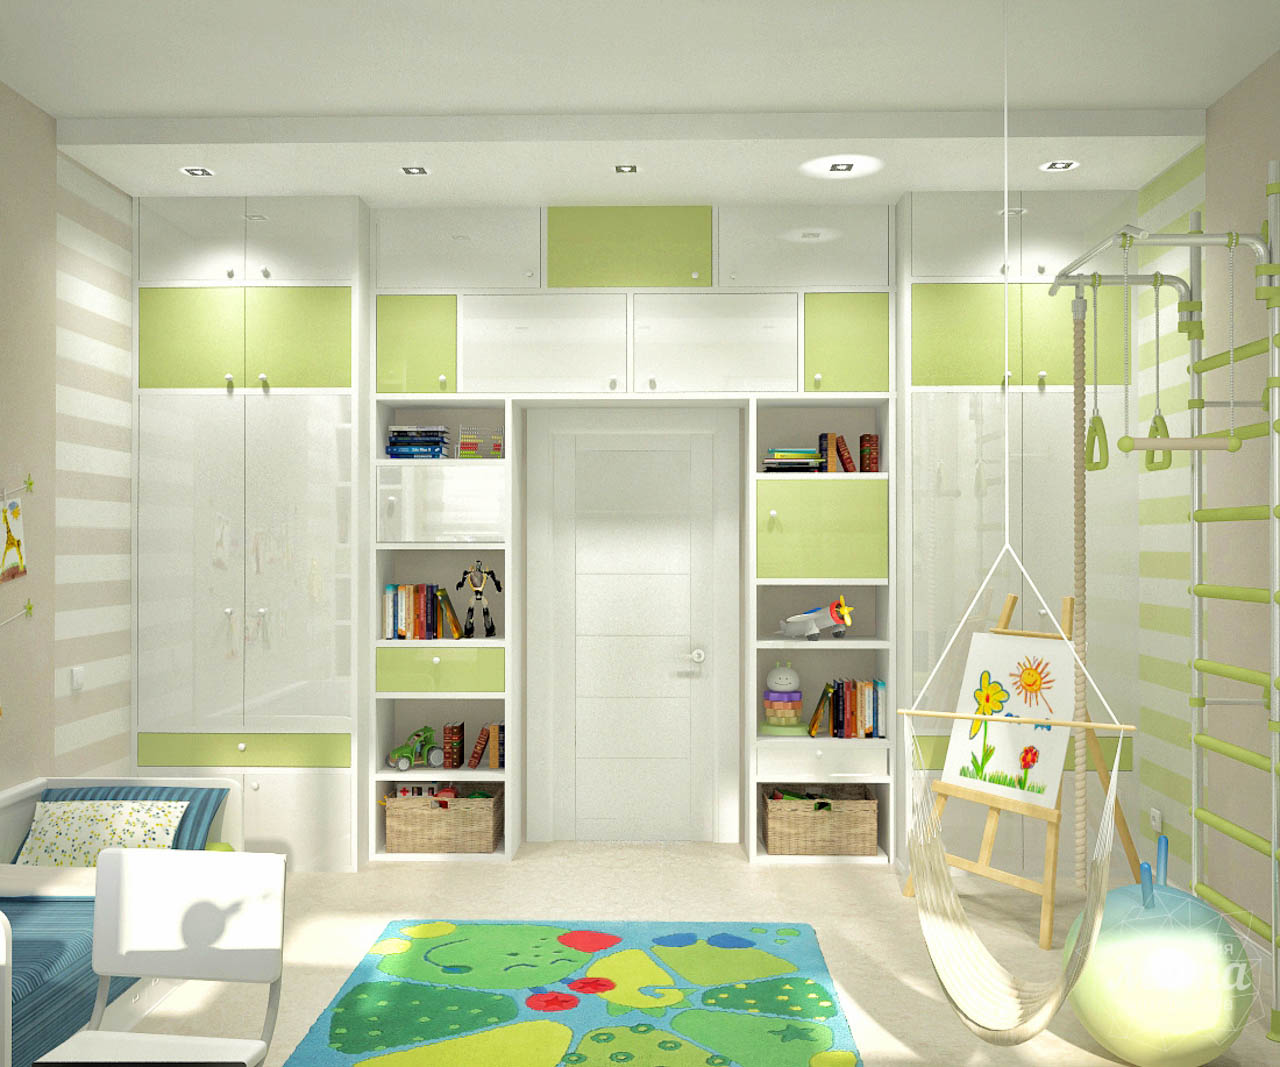 Дизайн интерьера и ремонт трехкомнатной квартиры по ул. Чкалова 124 img999435495